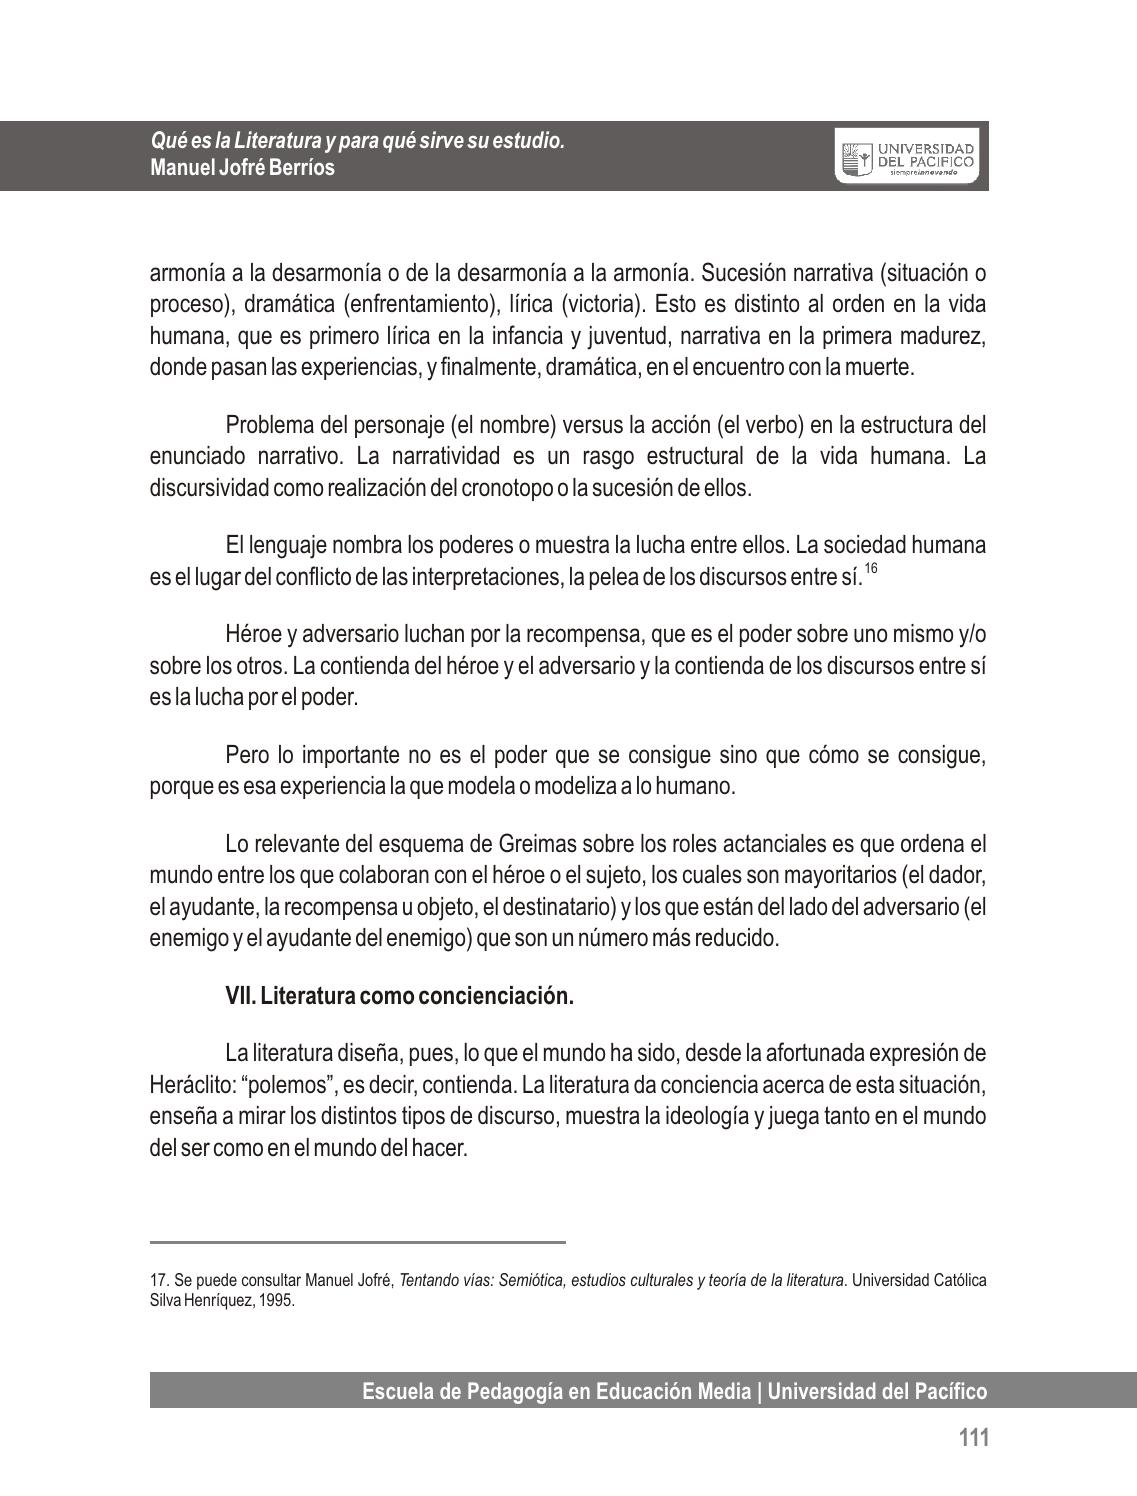 Revista 1 Completa By Adrián Villegas Dianta Issuu